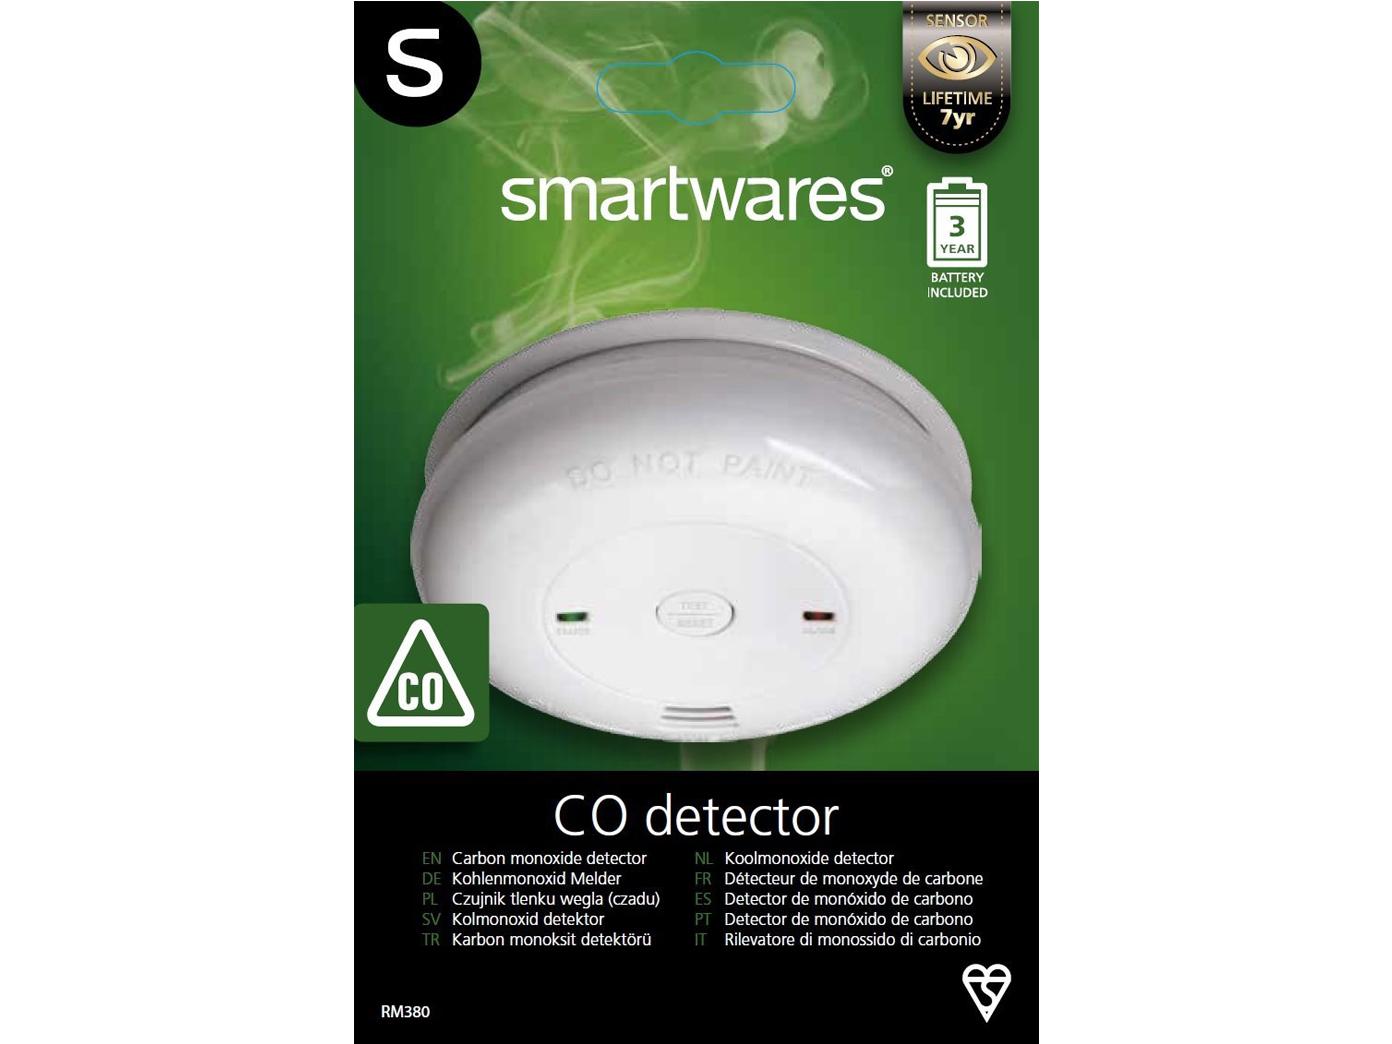 Gaswarngerät CO2 Melder Warner Gasdetektor Kohlenmonoxid Gas Warnmelder Alarm